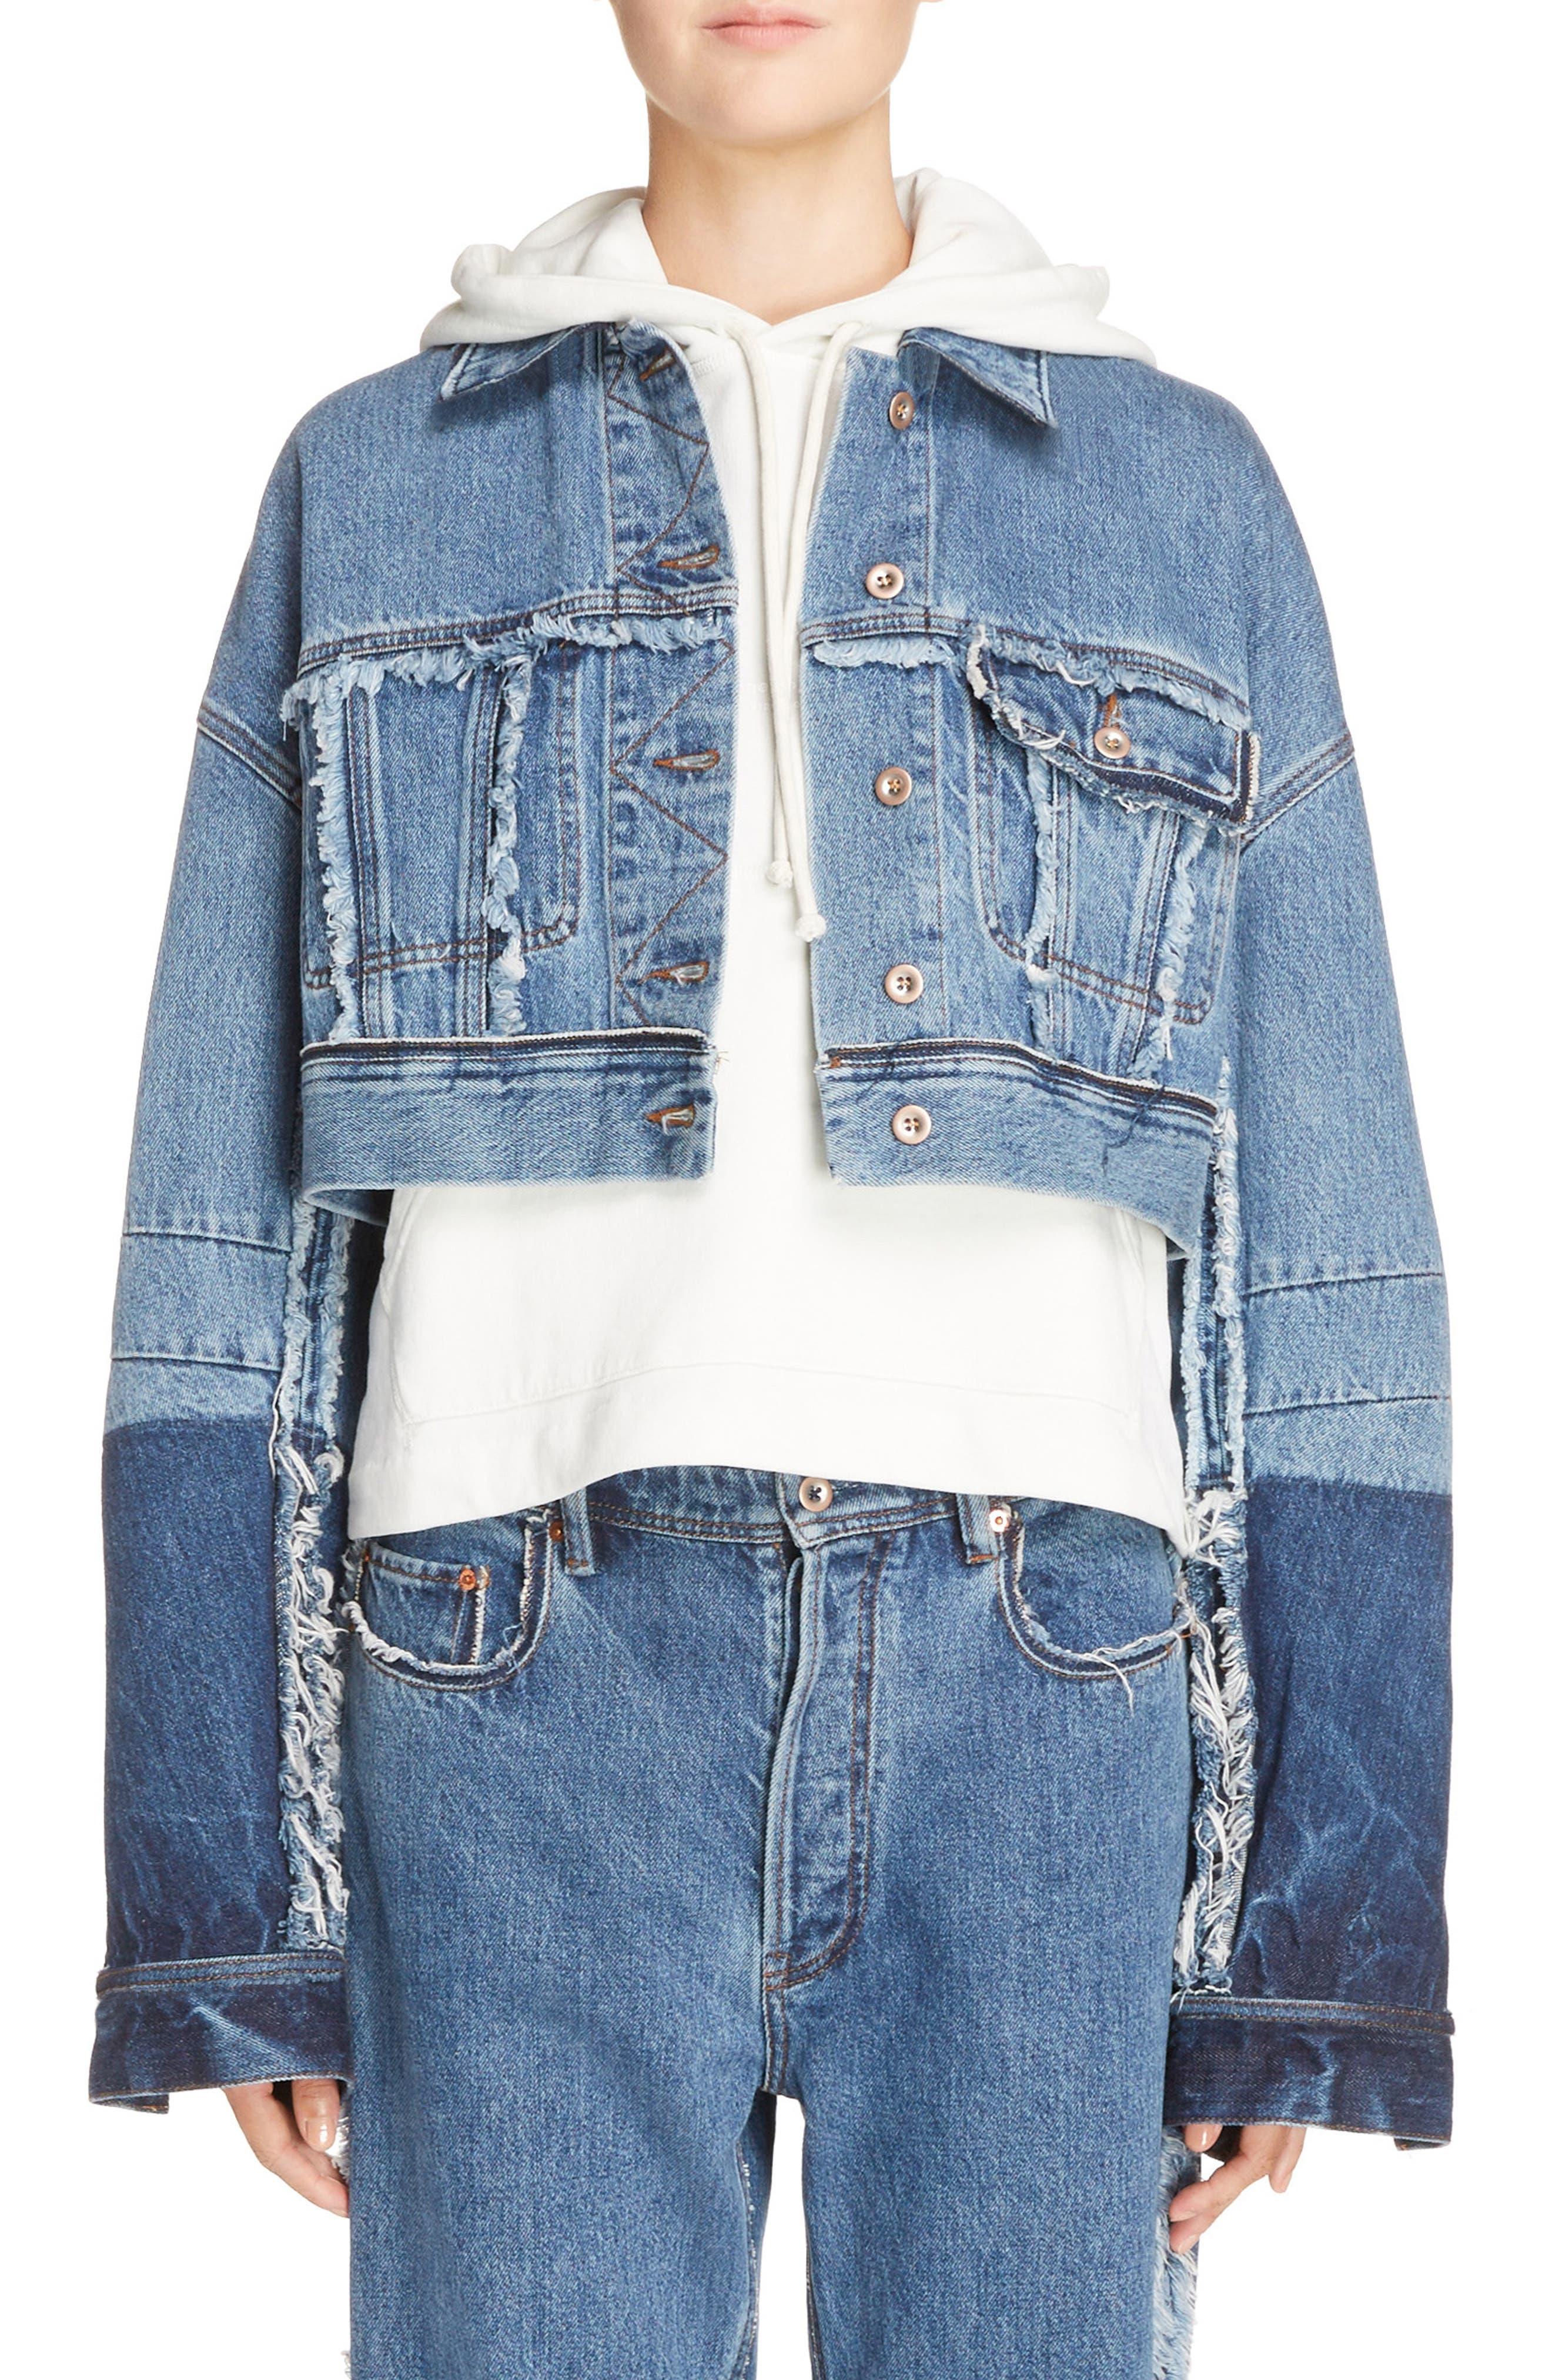 Kremi Crop Denim Jacket,                             Main thumbnail 1, color,                             400